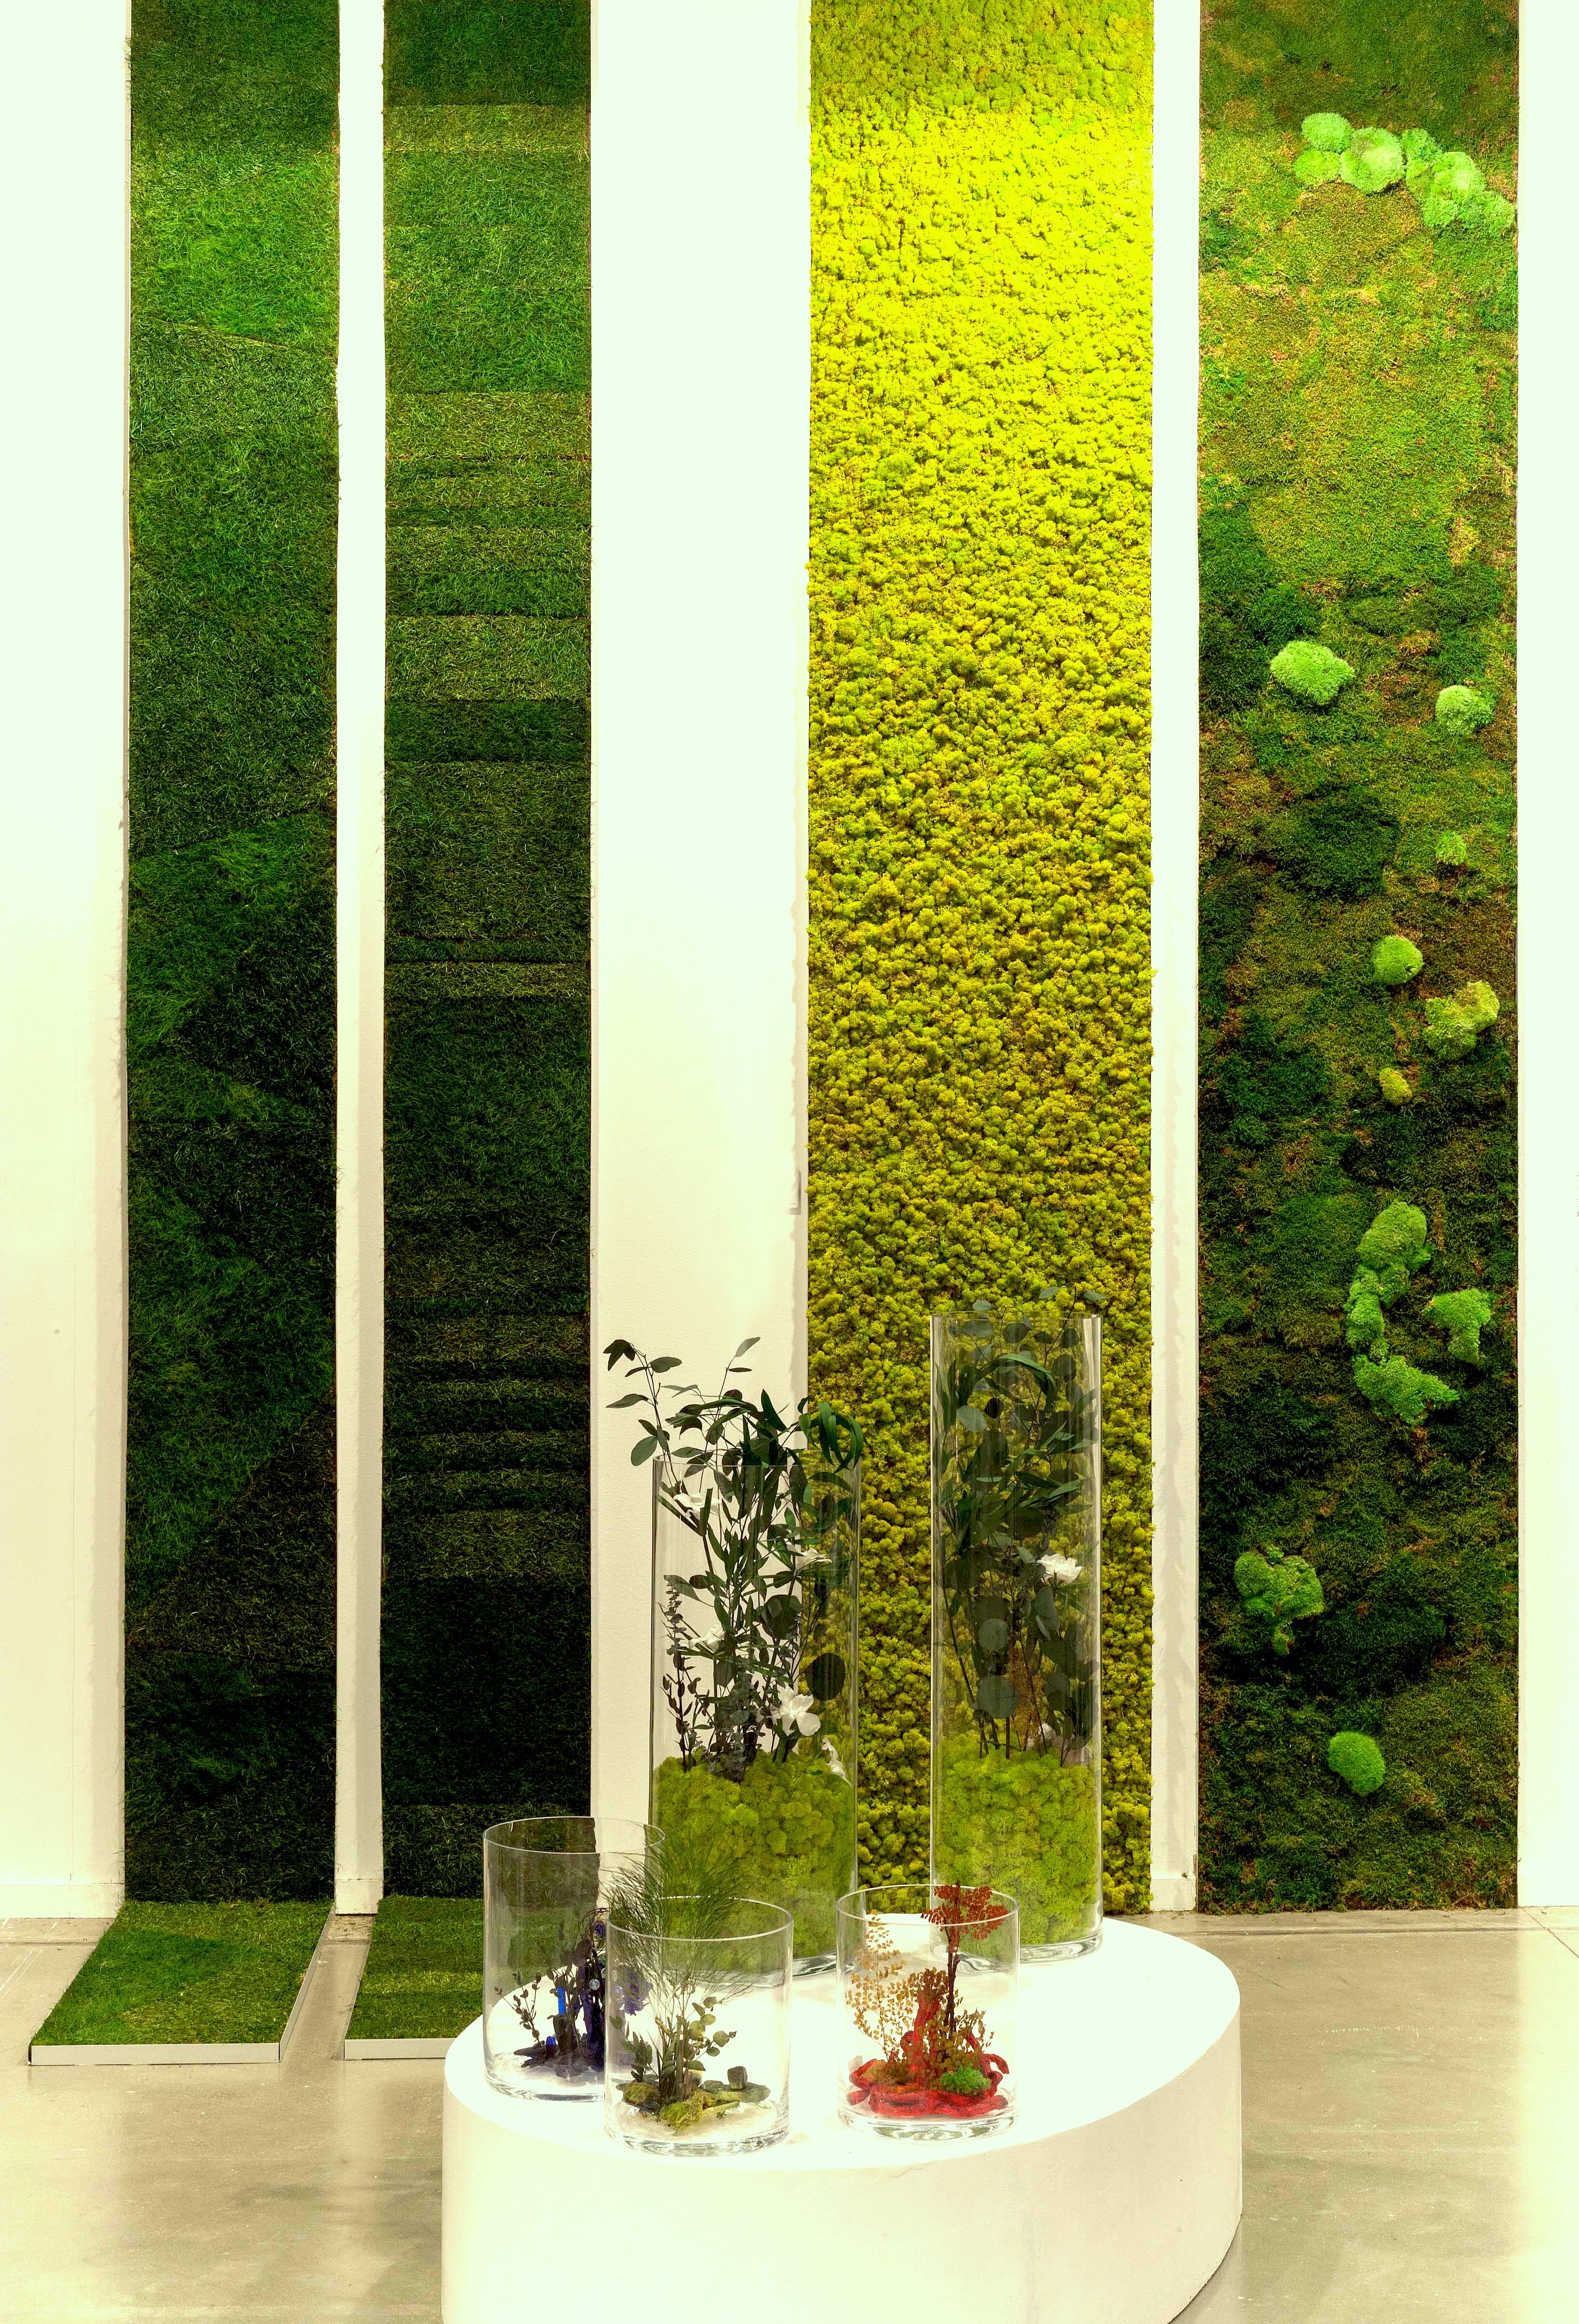 Jardines verticales monamour natural design for Materiales para jardines verticales